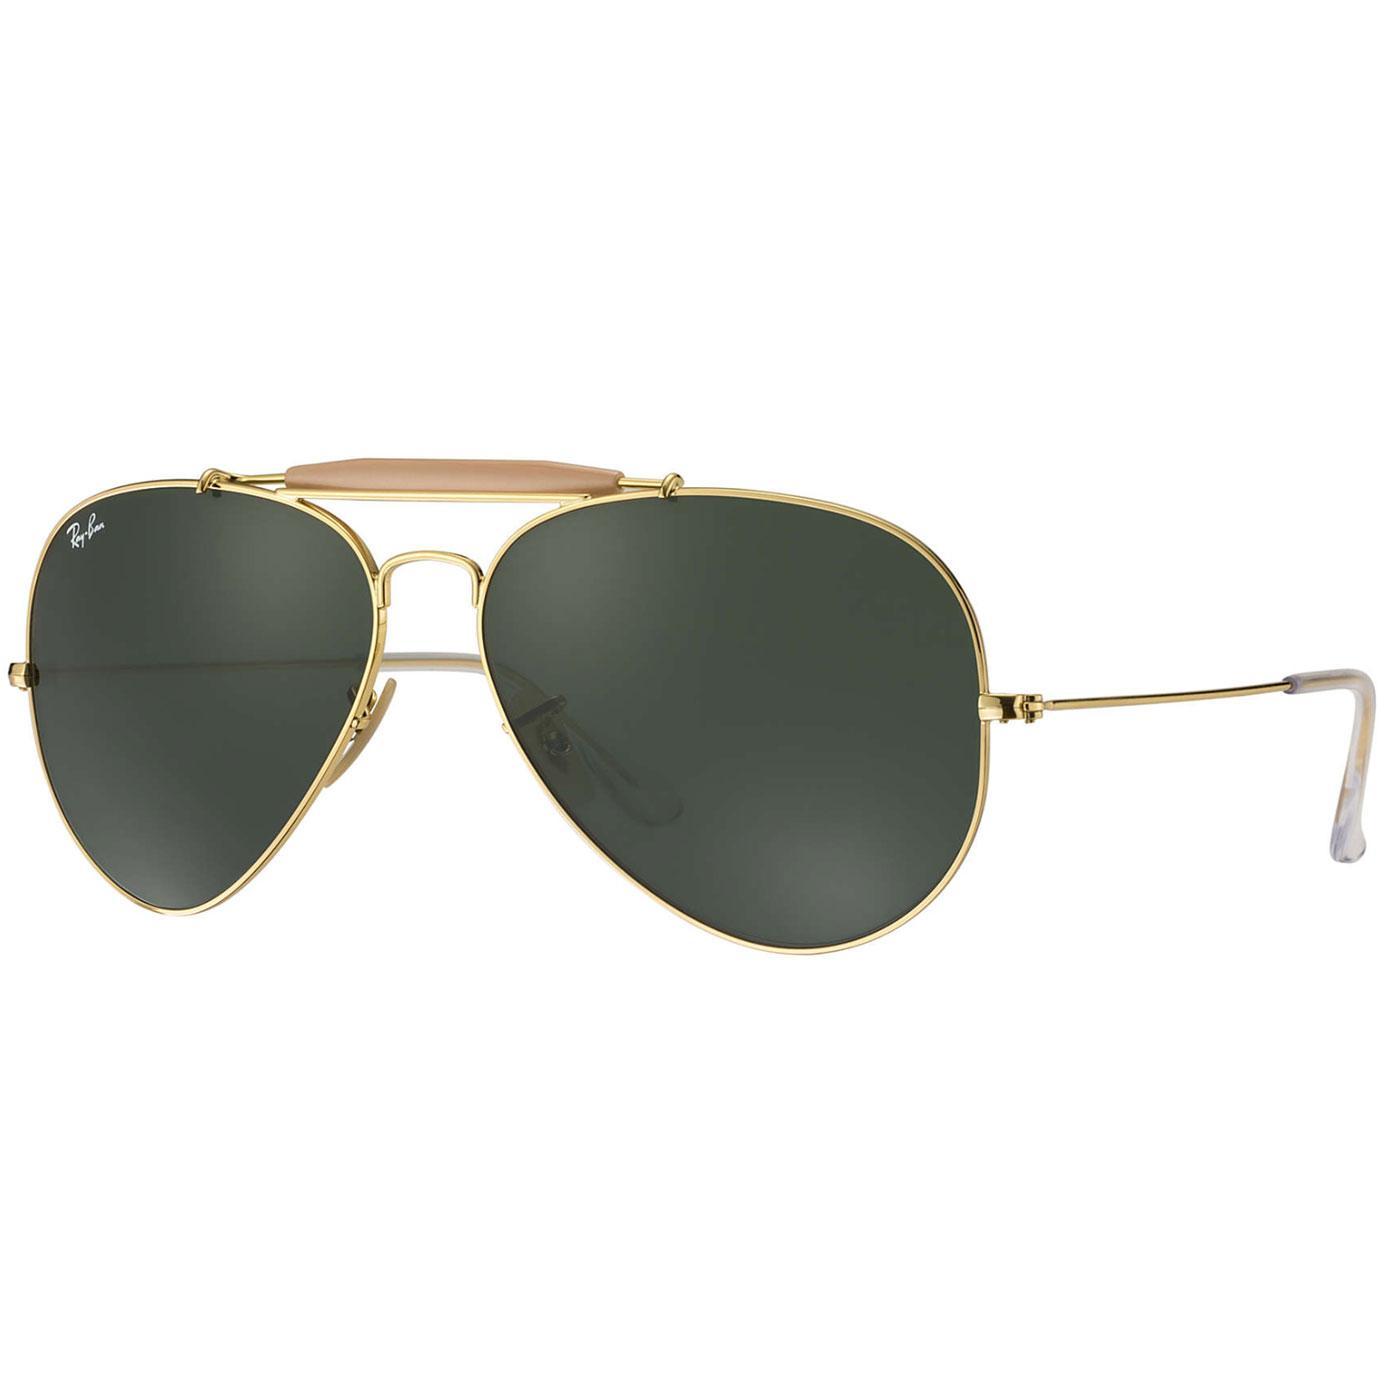 Ray-Ban Outdoorsman Retro Mod Aviator Sunglasses G